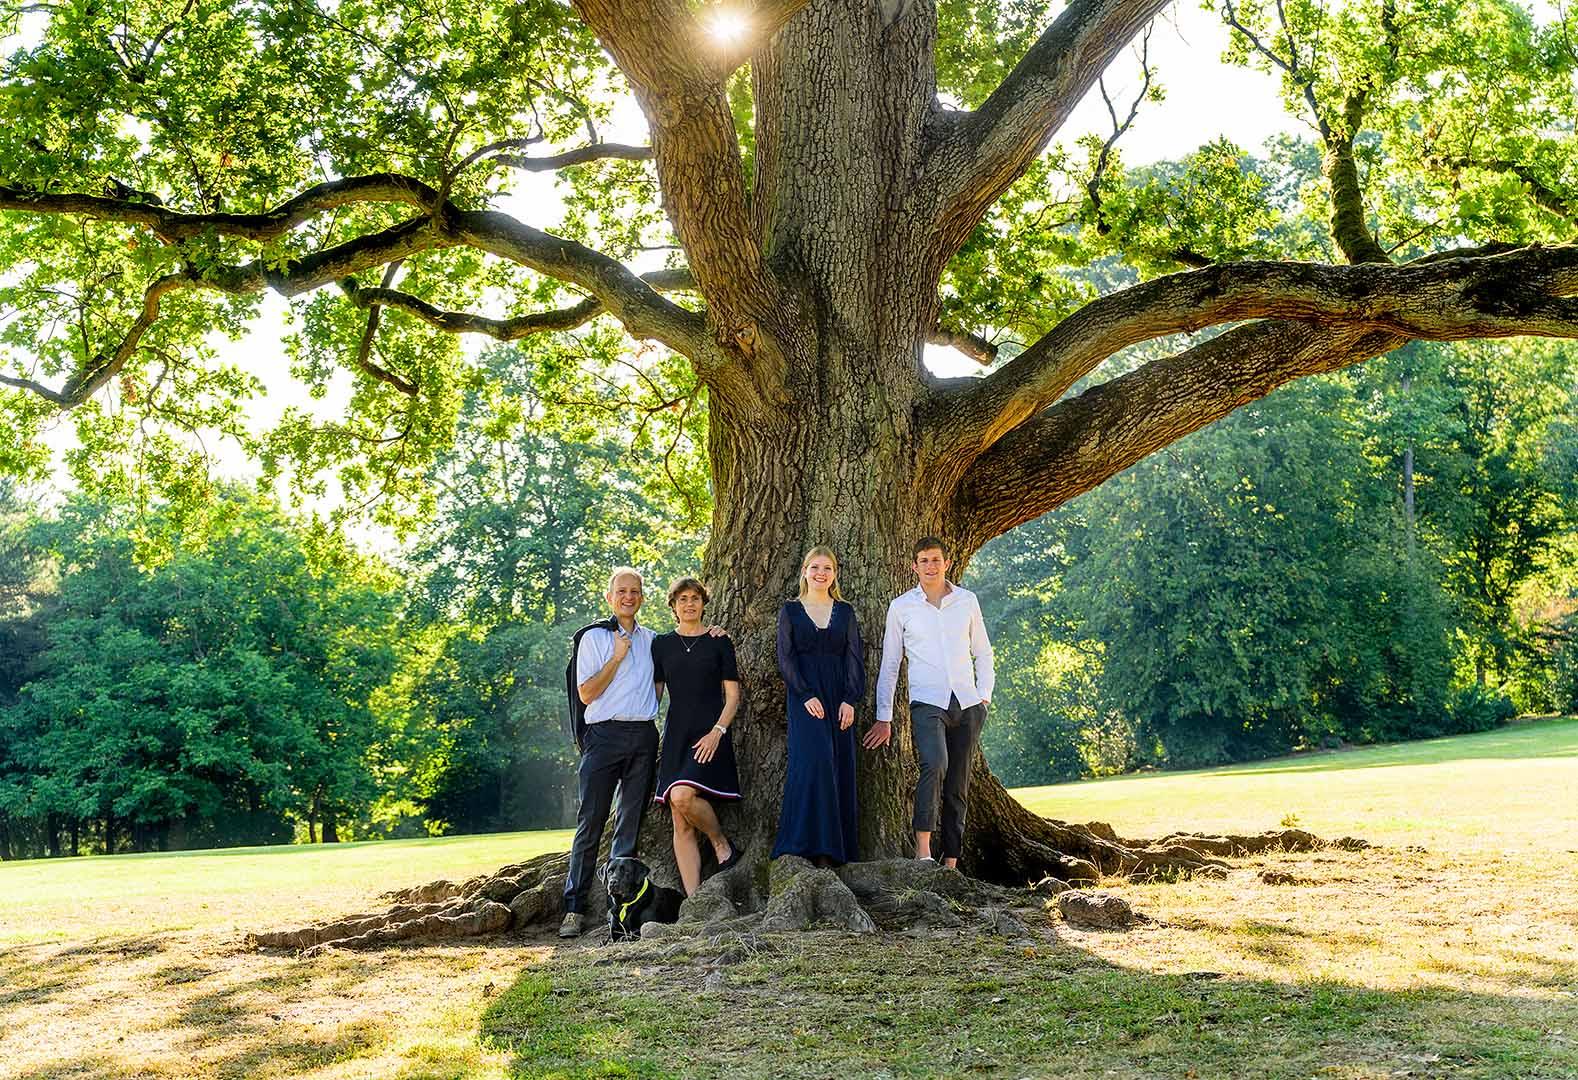 fotograf-familienfotos-weinheim-mannheim-heidelberg